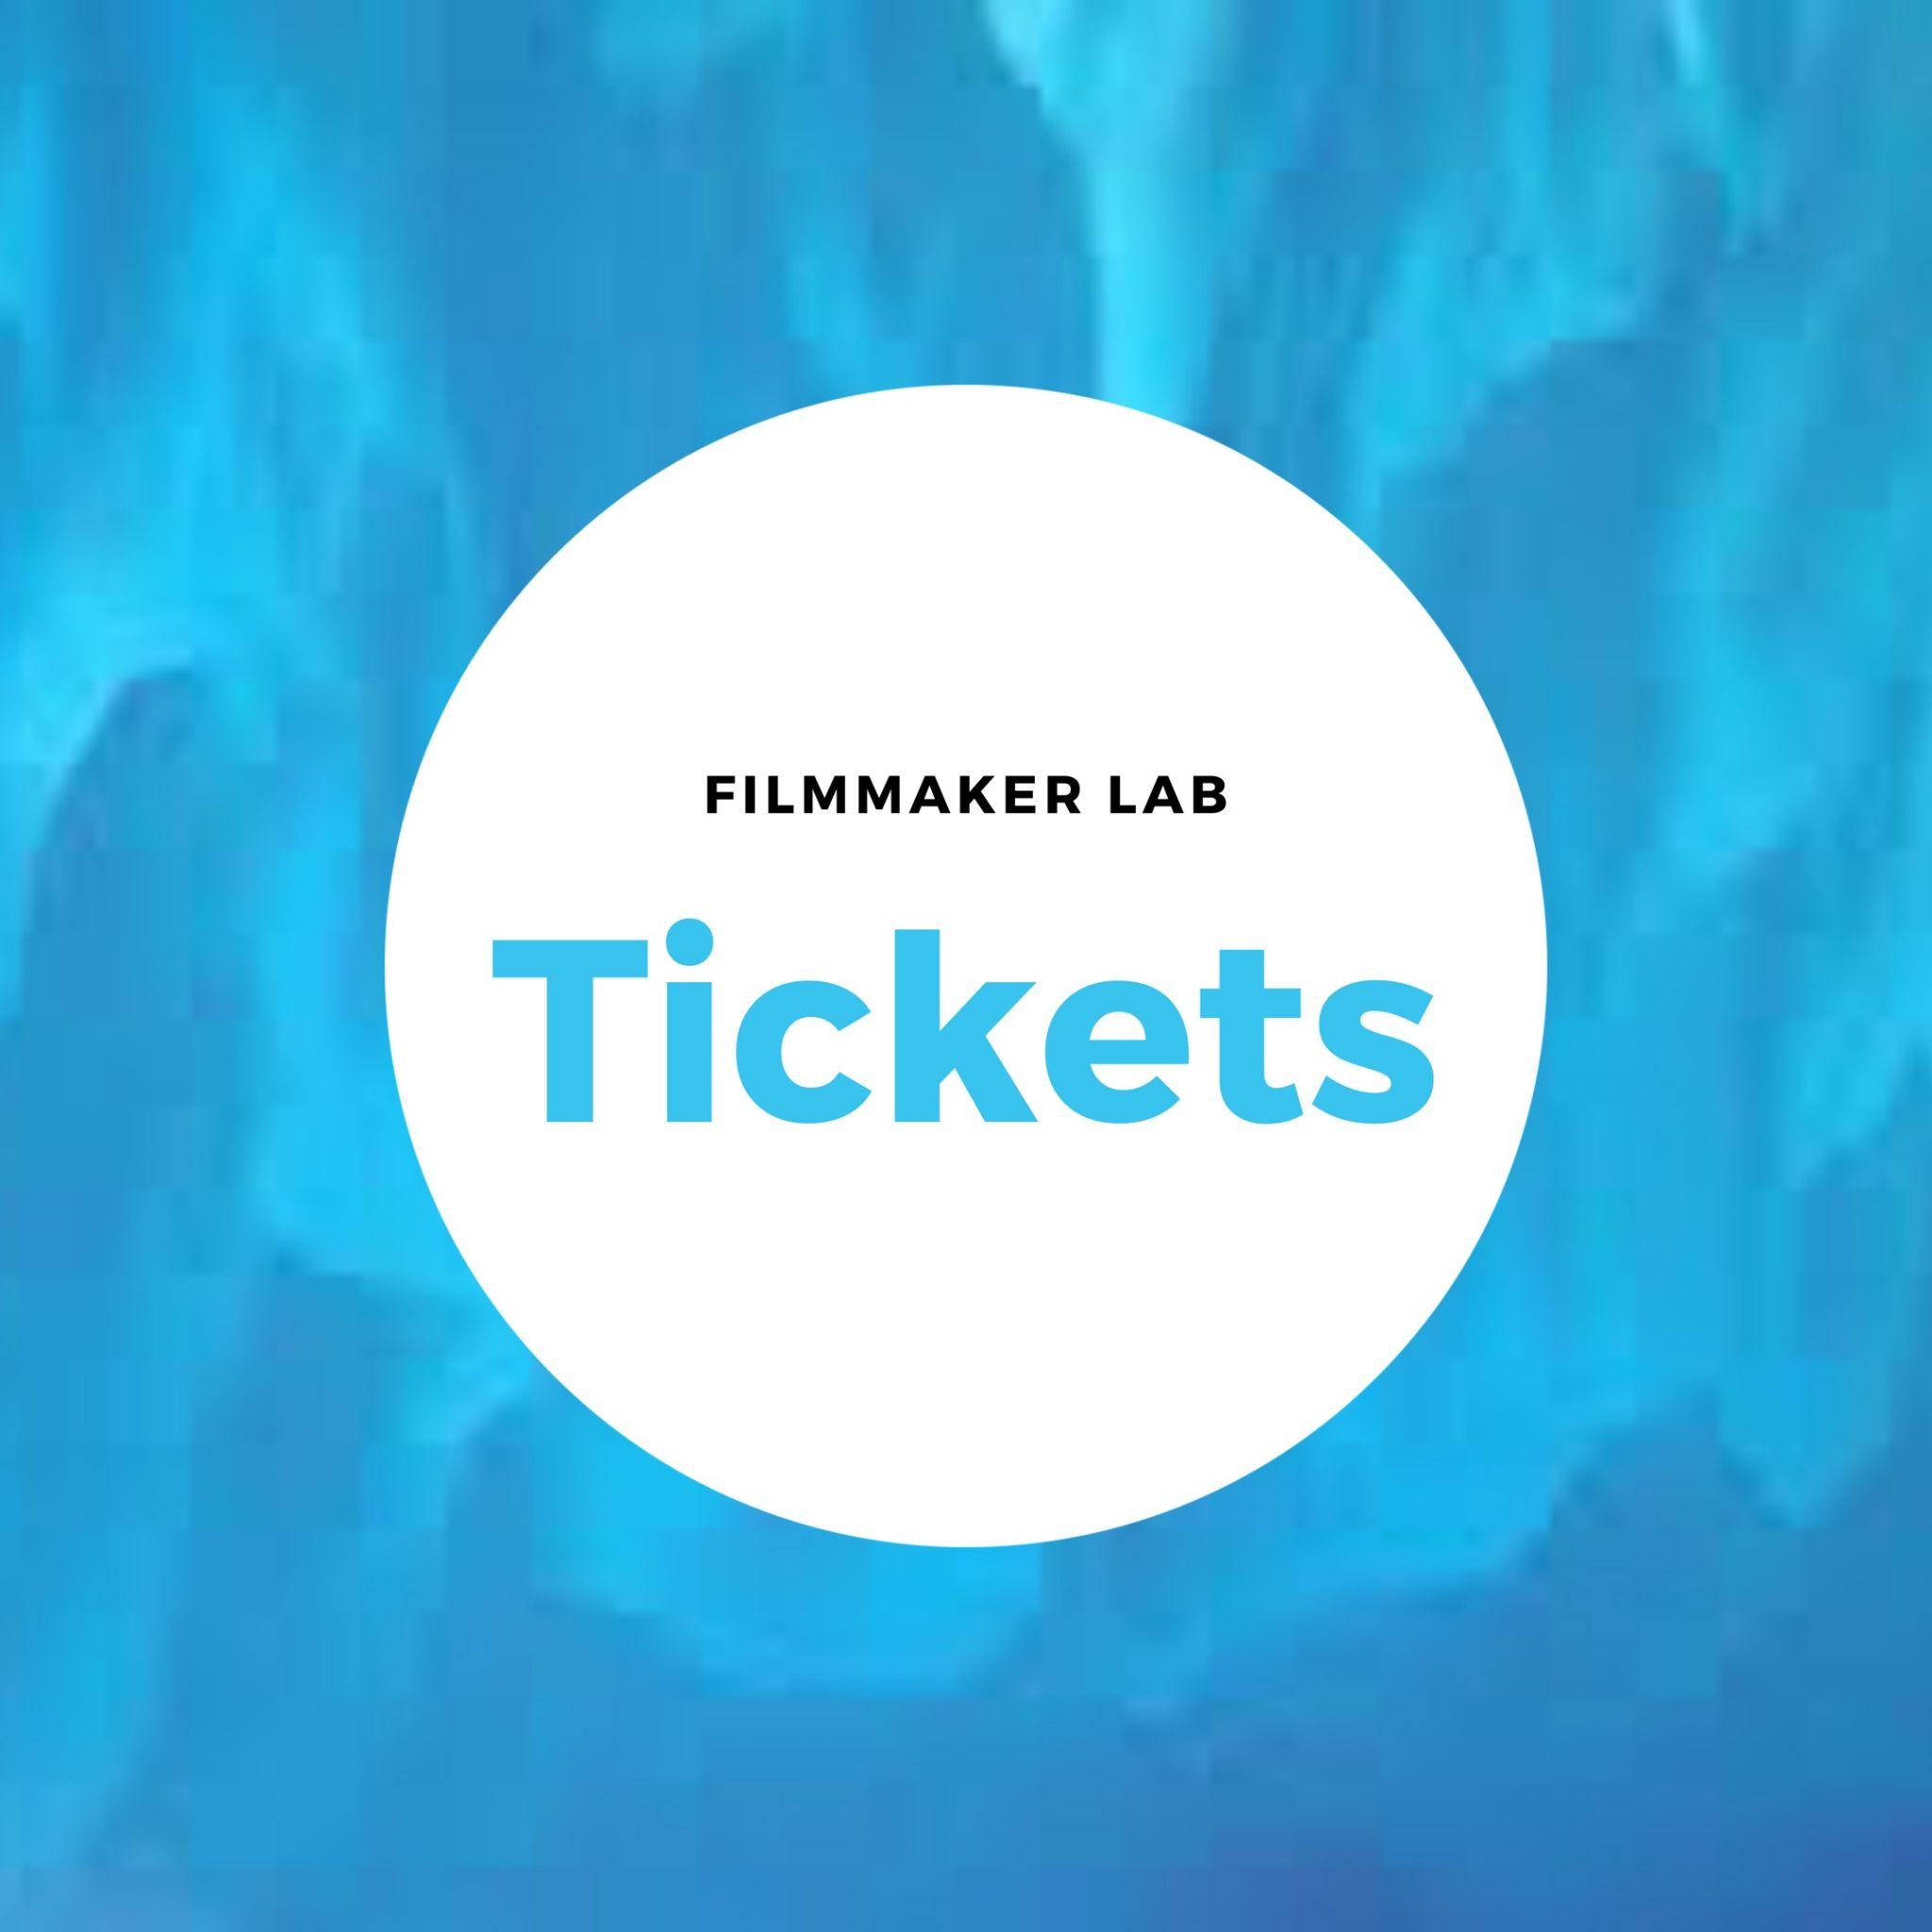 Attend all filmmaker labs at Met Film School (Ealing Studios)